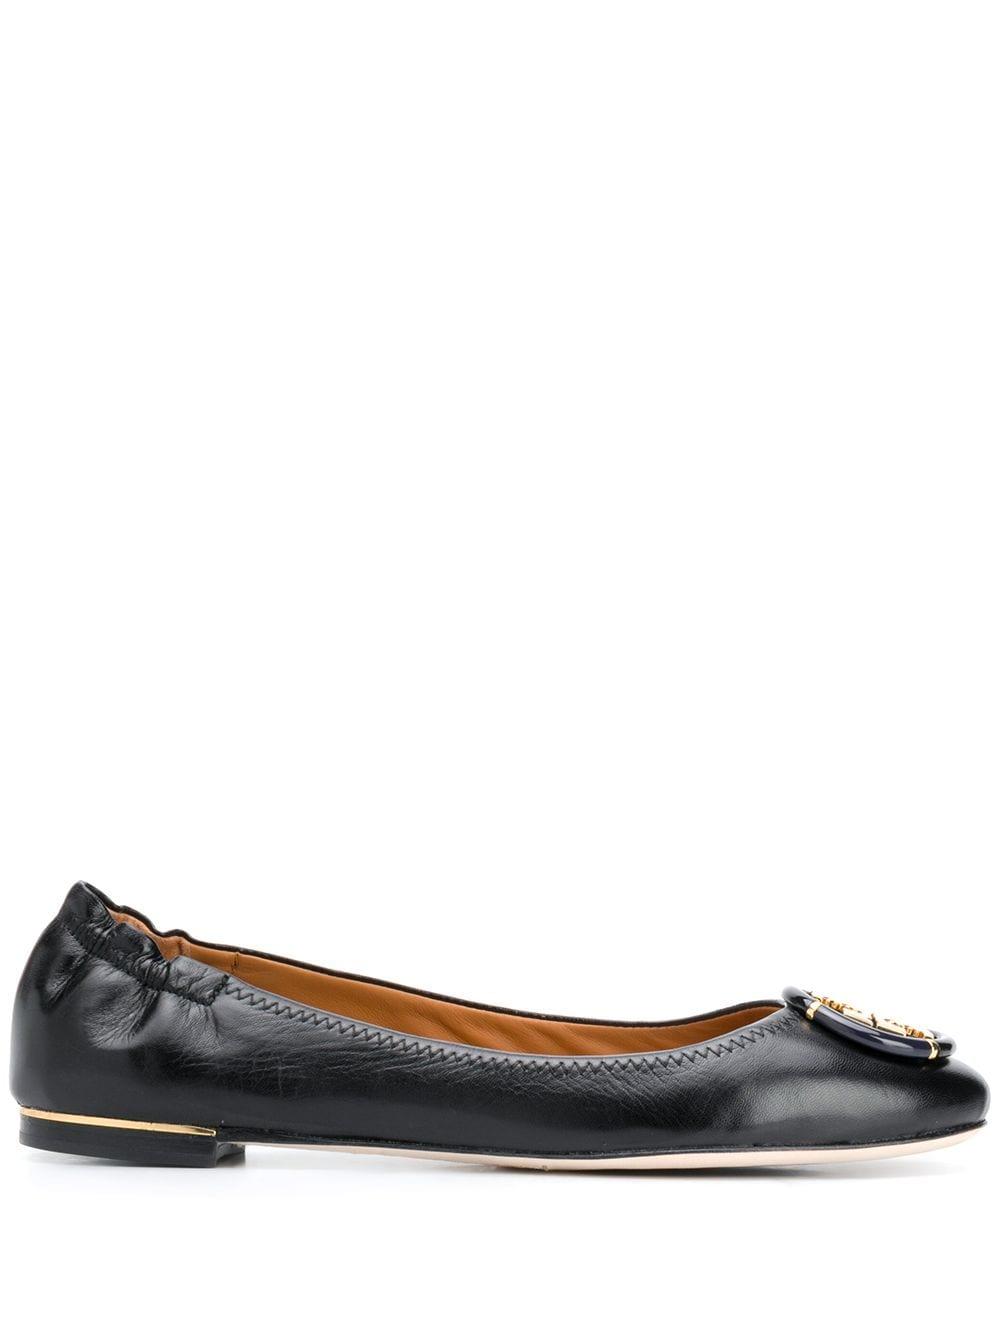 Minnie Leather Ballet Flats